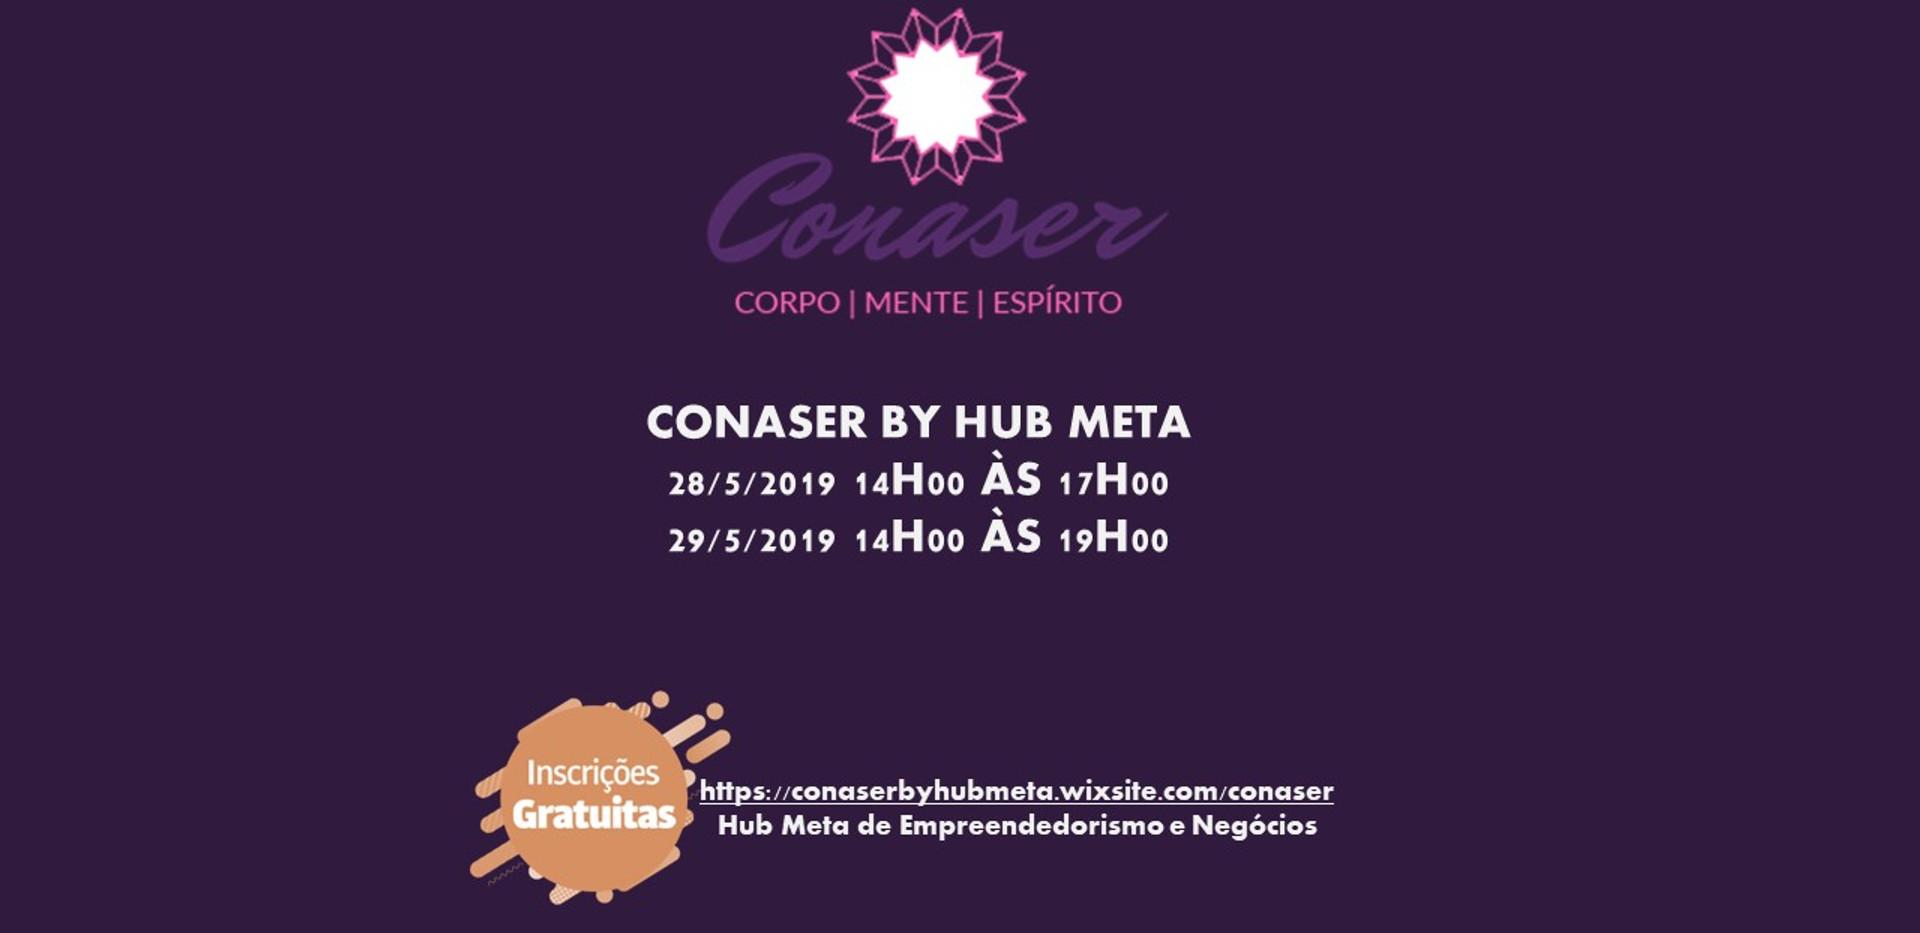 vinheta-hubmeta-comlogos-2019-CONASER-1.